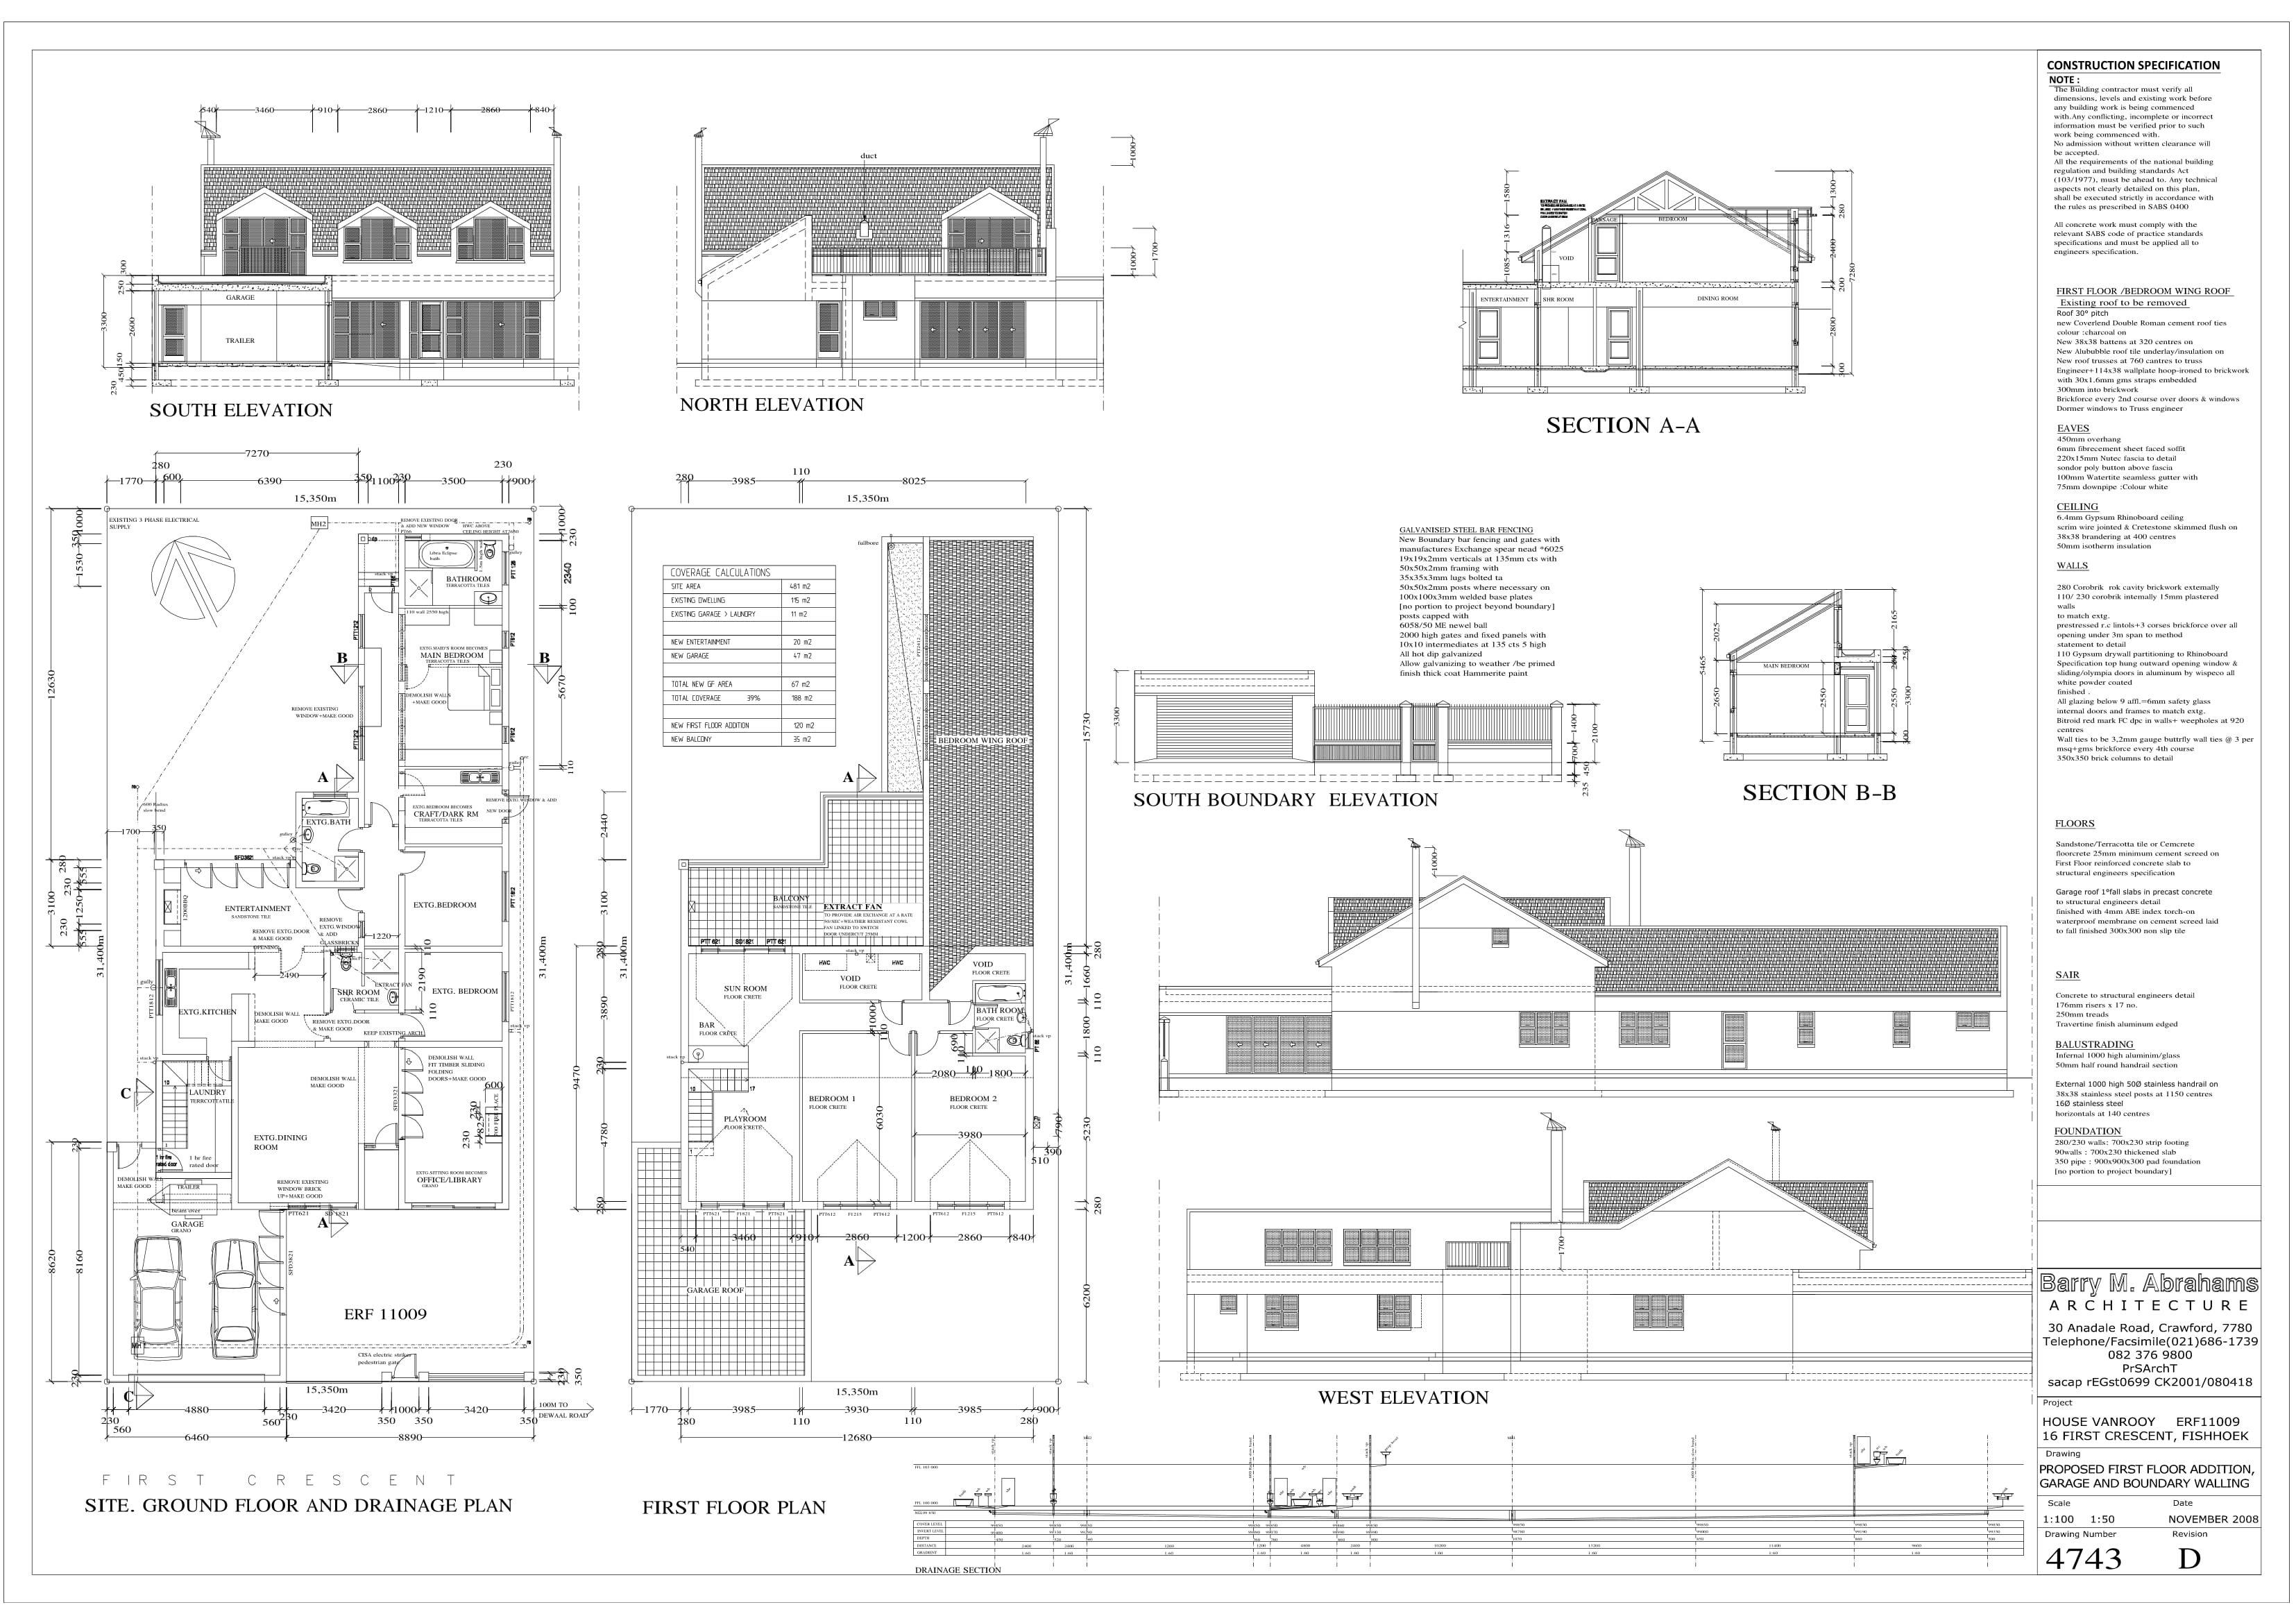 Hvac Shop Drawing Checklist - Peugeot Partner Van Fuse Box -  pipiiing-layout.diau.tiralarc-bretagne.fr | Hvac Shop Drawing Checklist |  | Wiring Diagram Resource